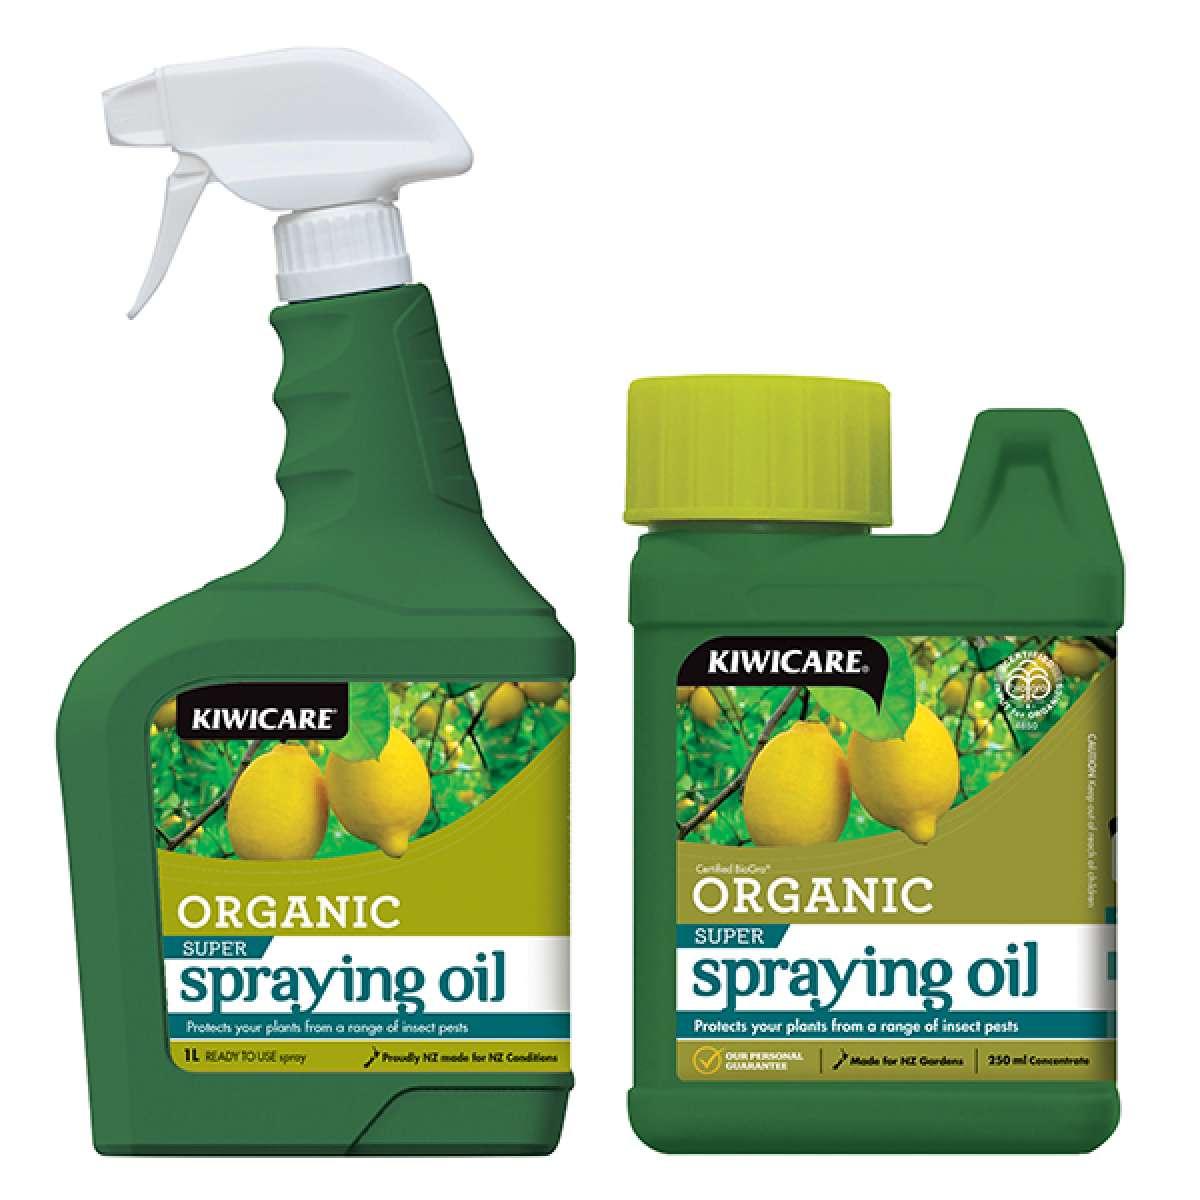 Organic-Super-Spraying-Oil.jpg